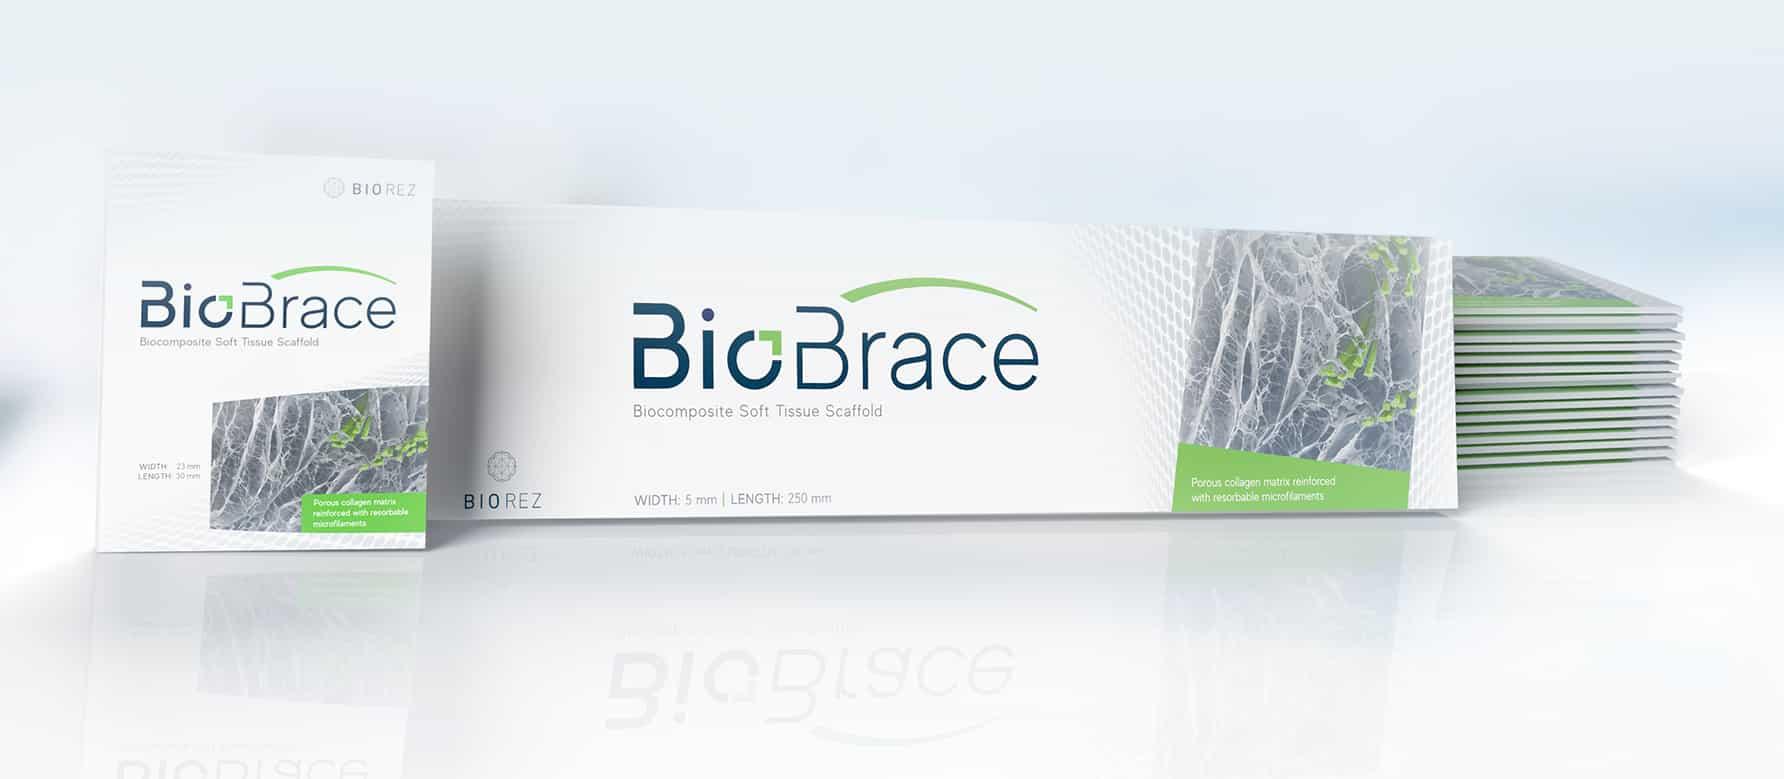 biobrace-package-5